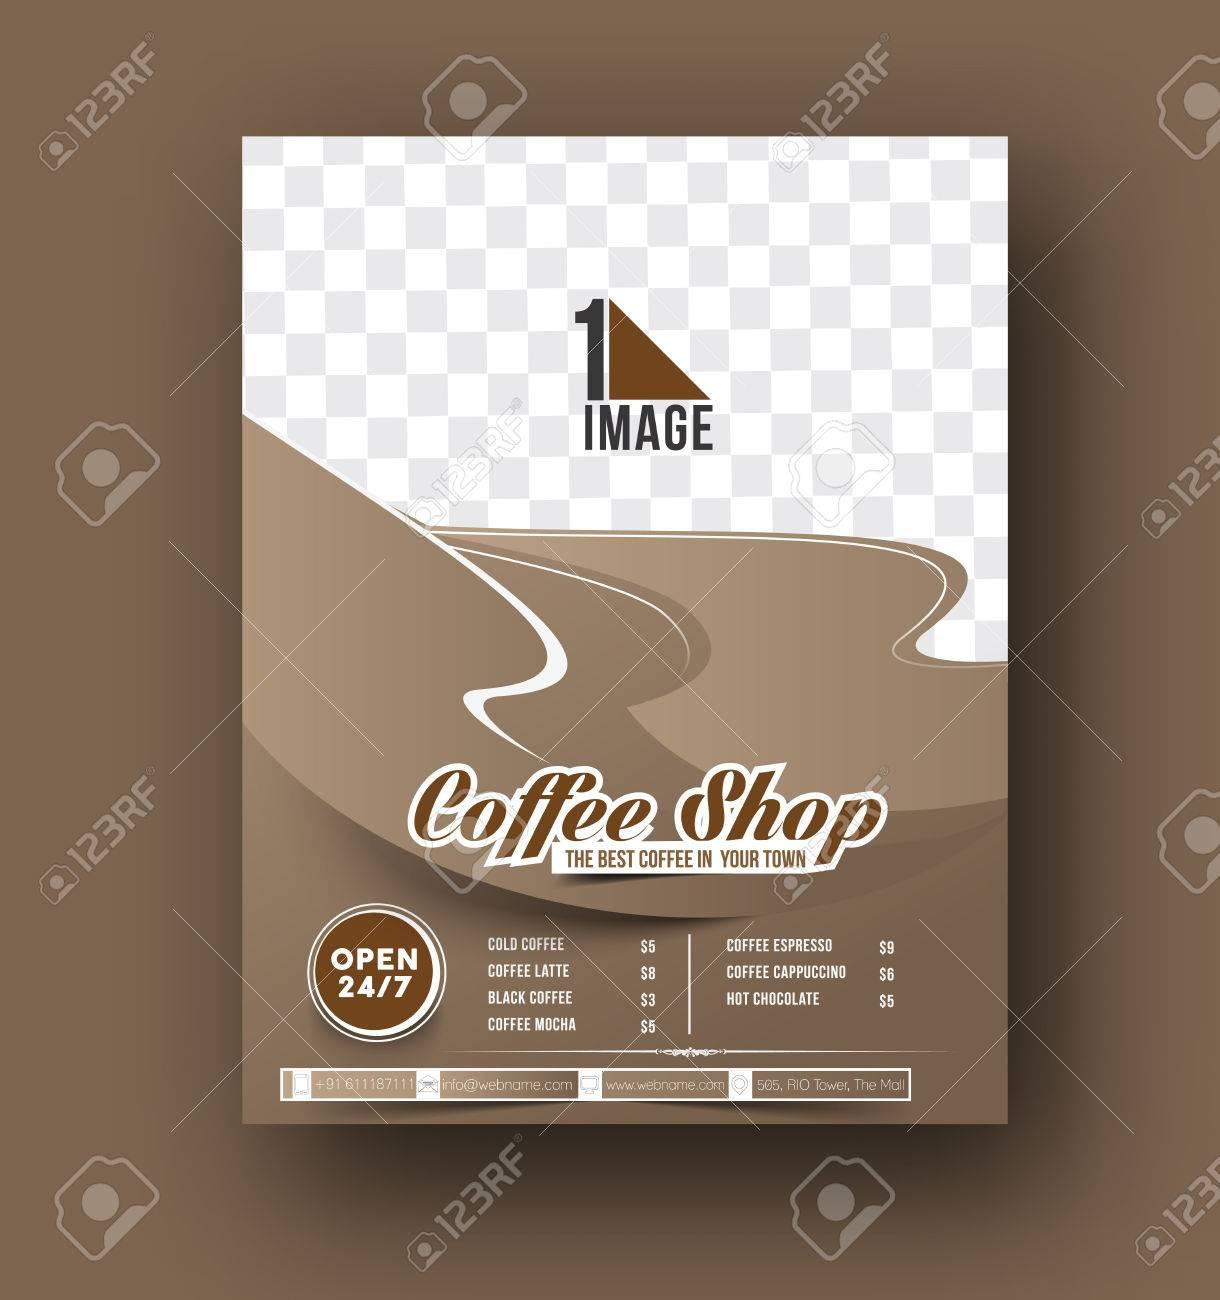 Tarjeta Del Menú Del Café Casa Folleto, Portada De Revista Y ...